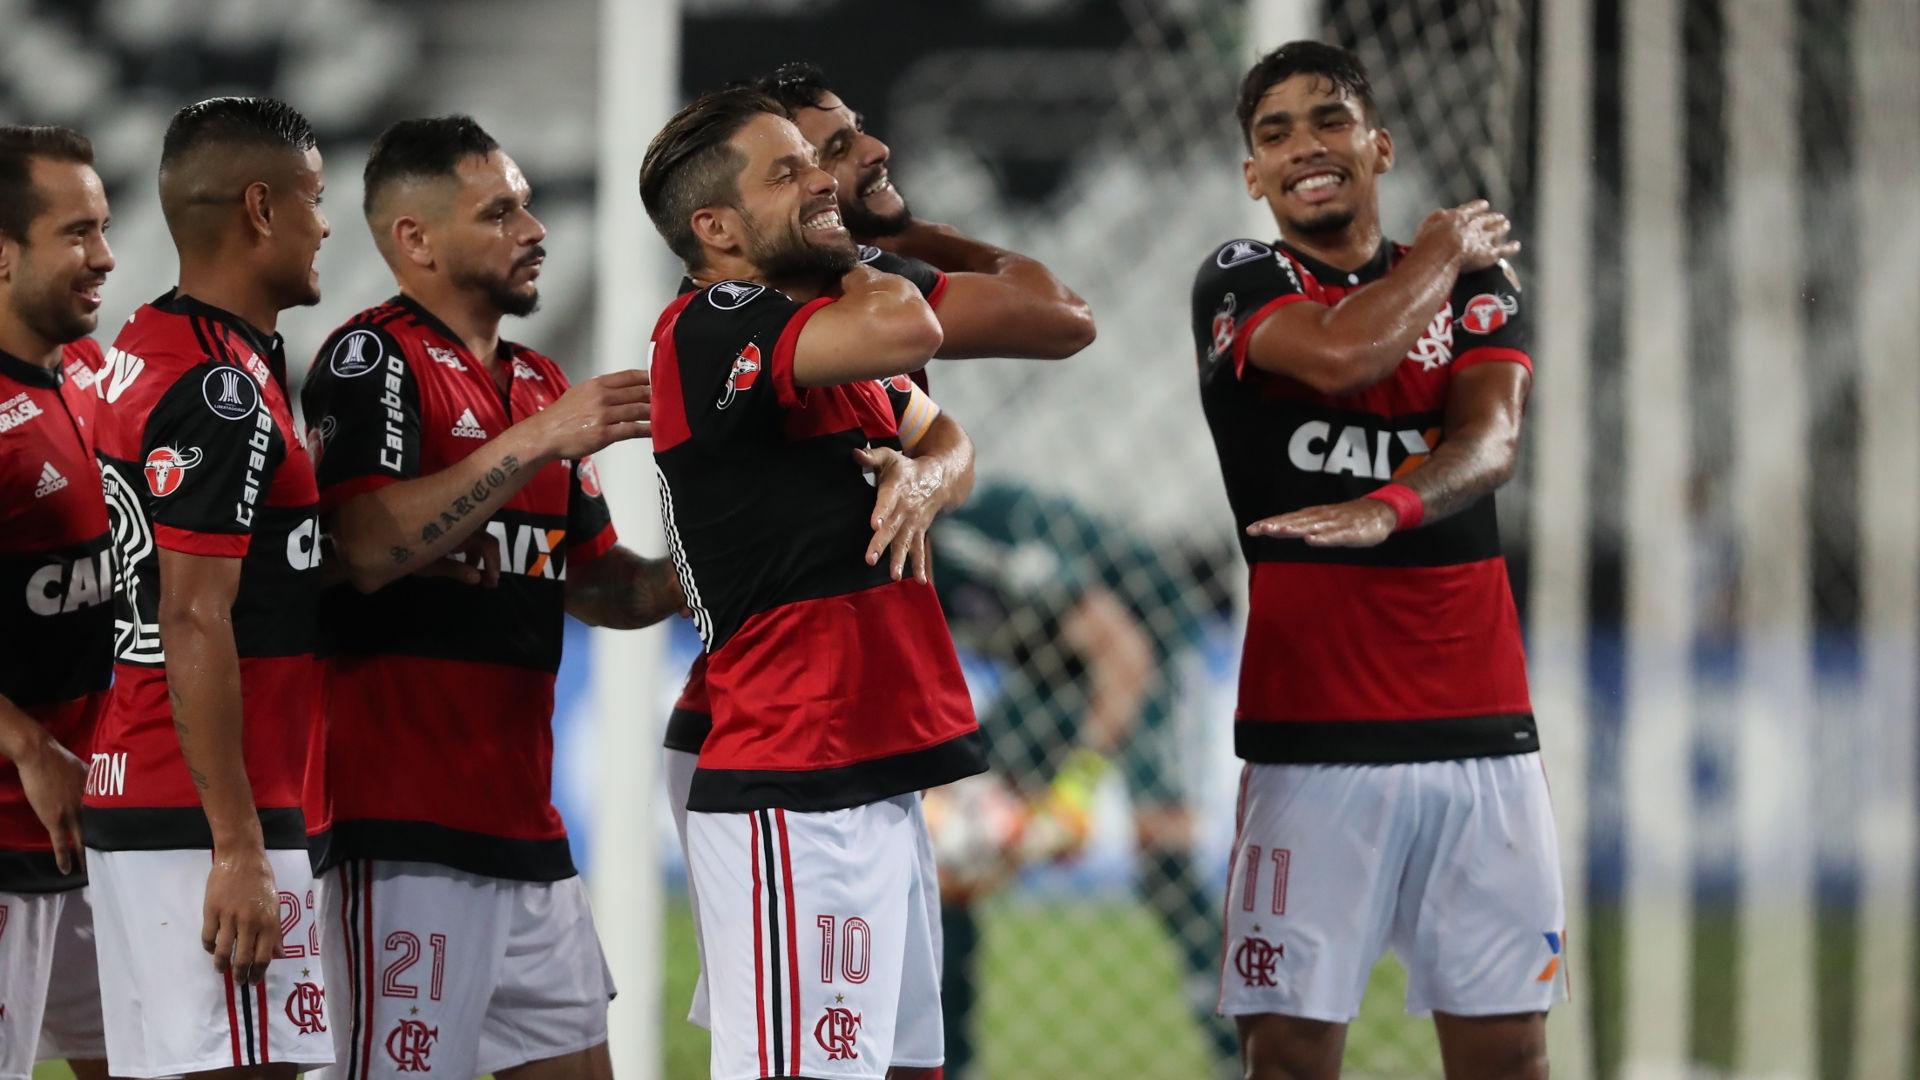 Henrique Dourado Diego Flamengo River Plate 28022018 Copa Libertadores